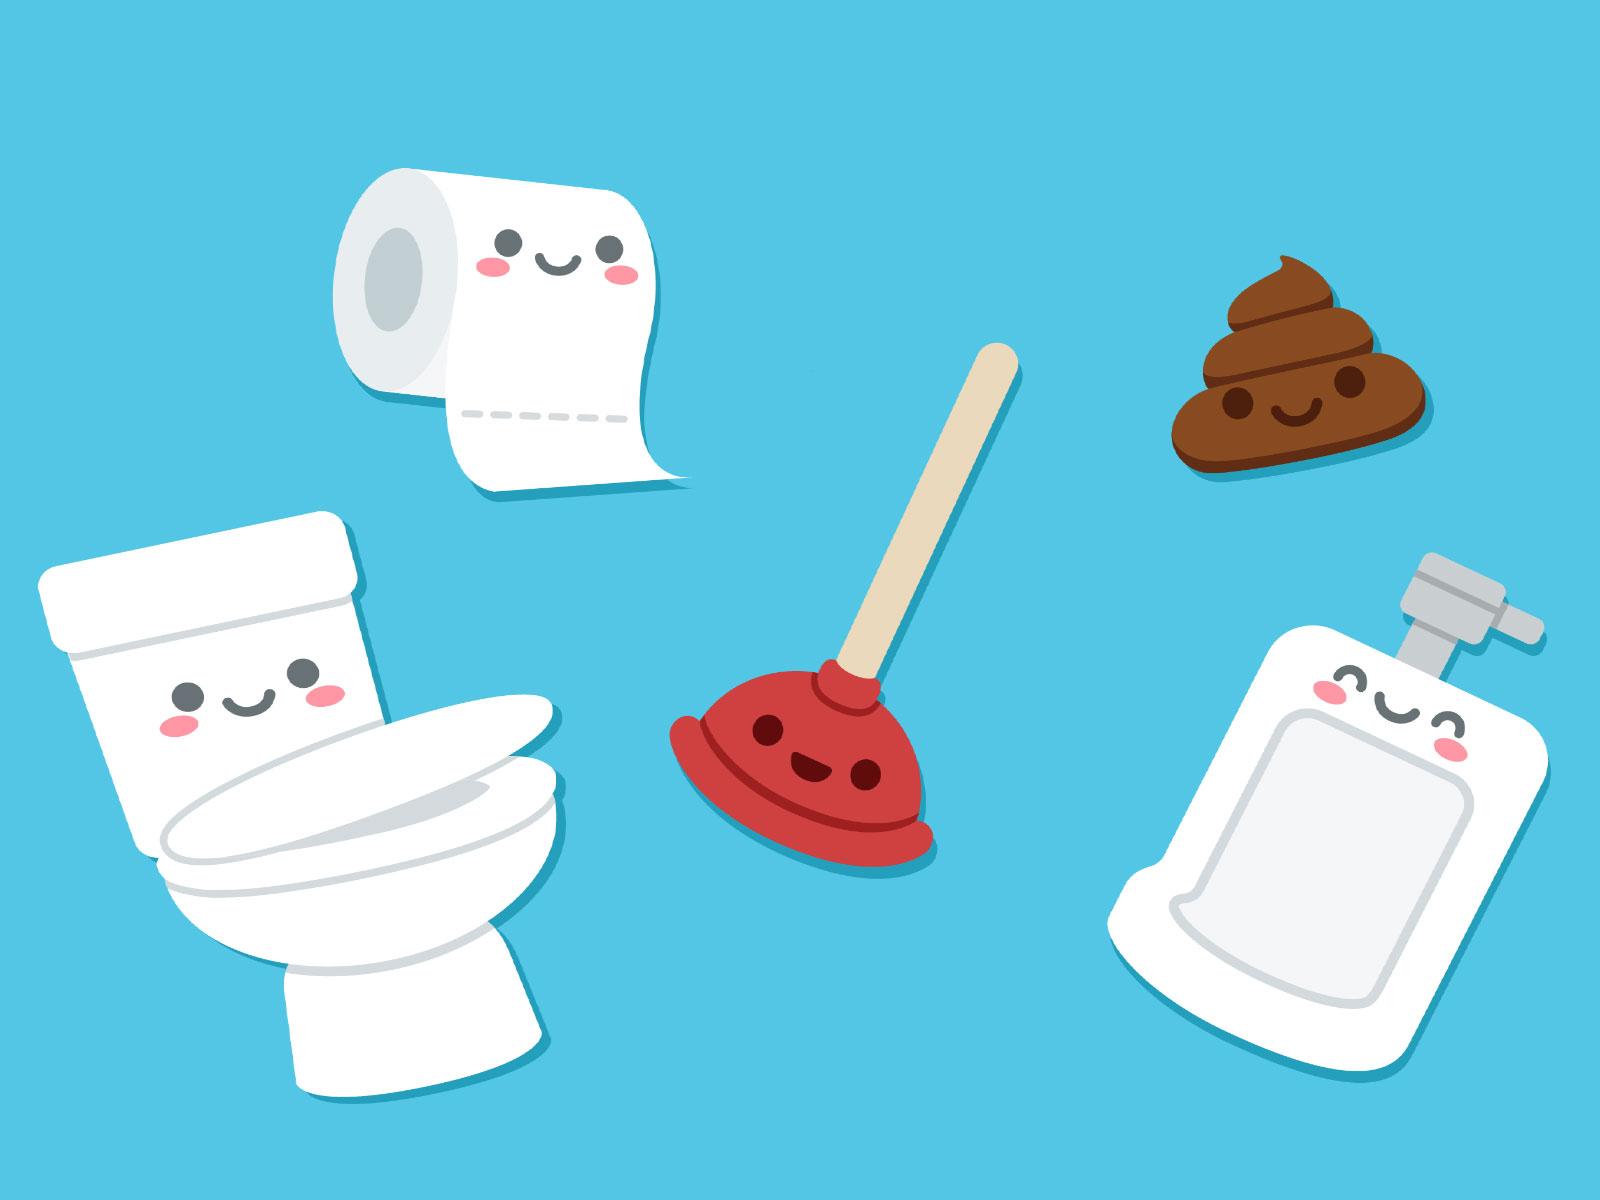 Cartoon, toilet, paper towel, urinal